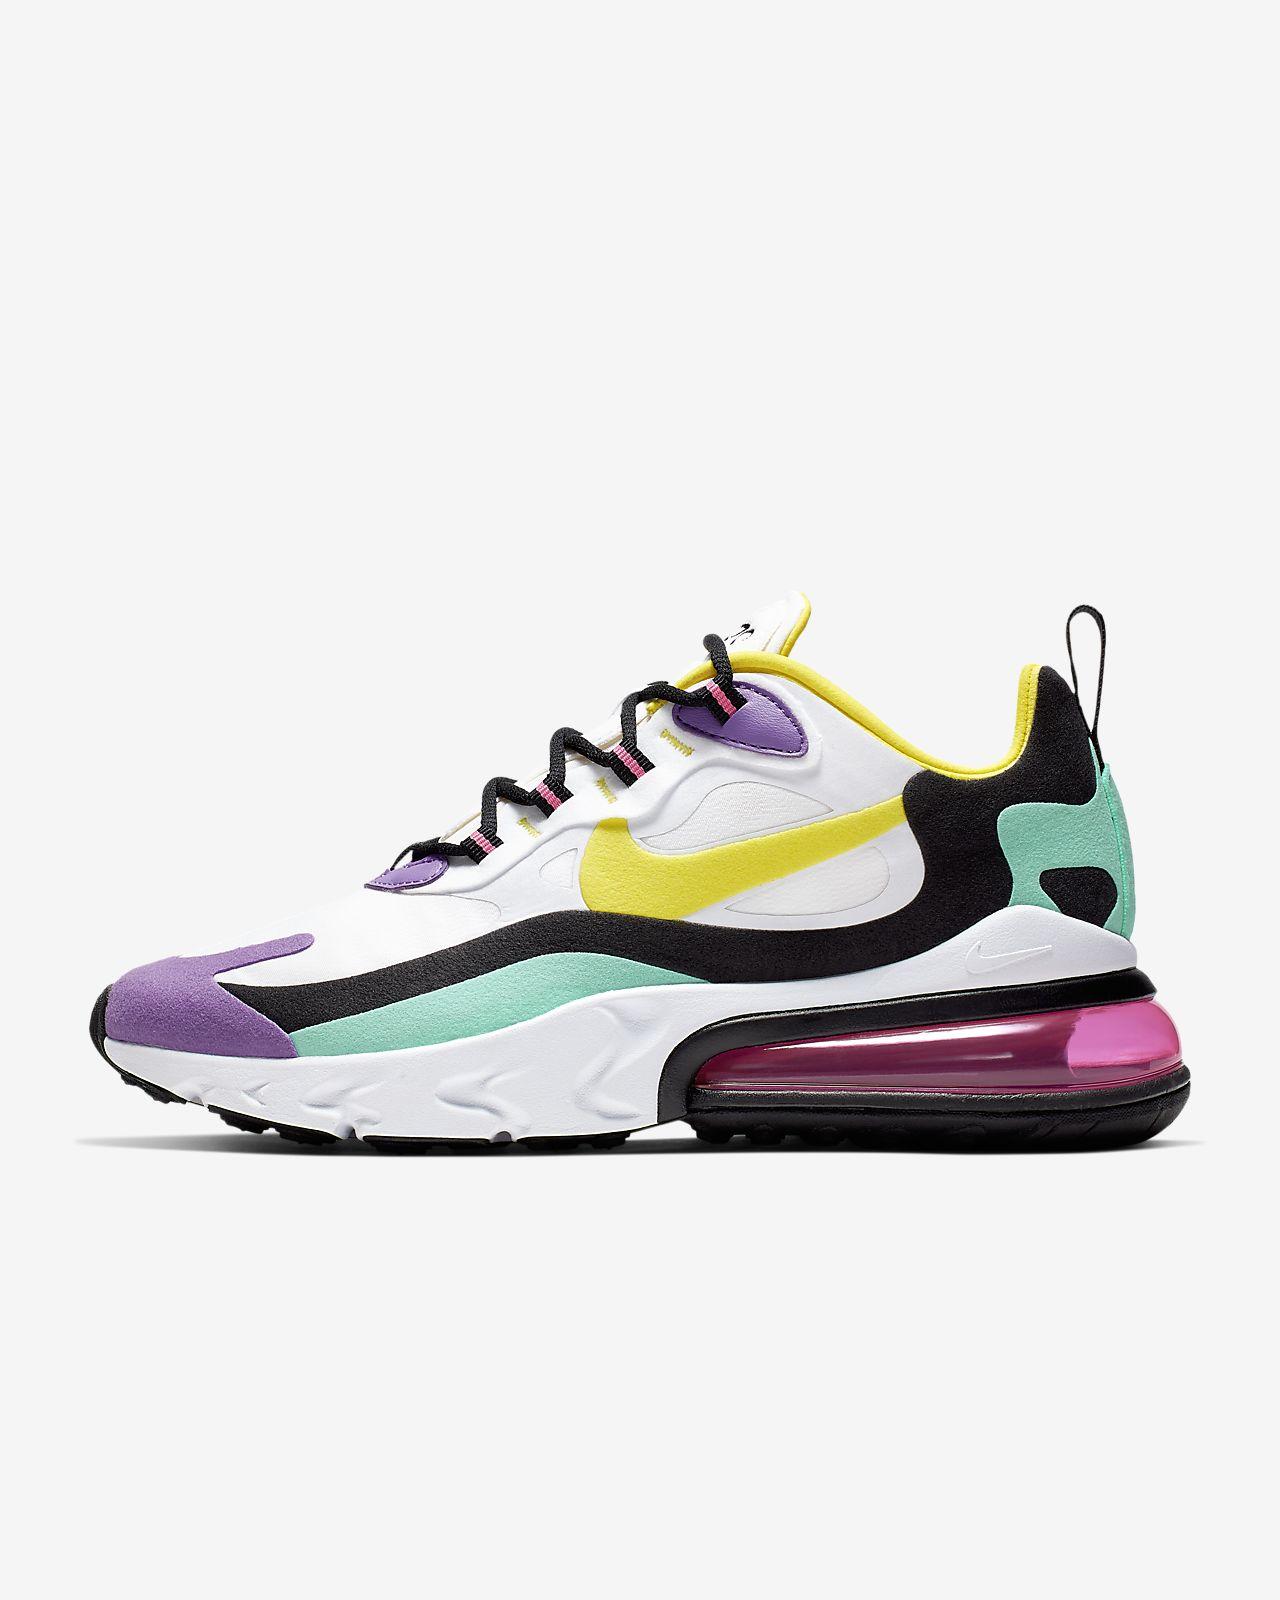 Nike Air Max 270 React (Geometric Abstract) 女鞋